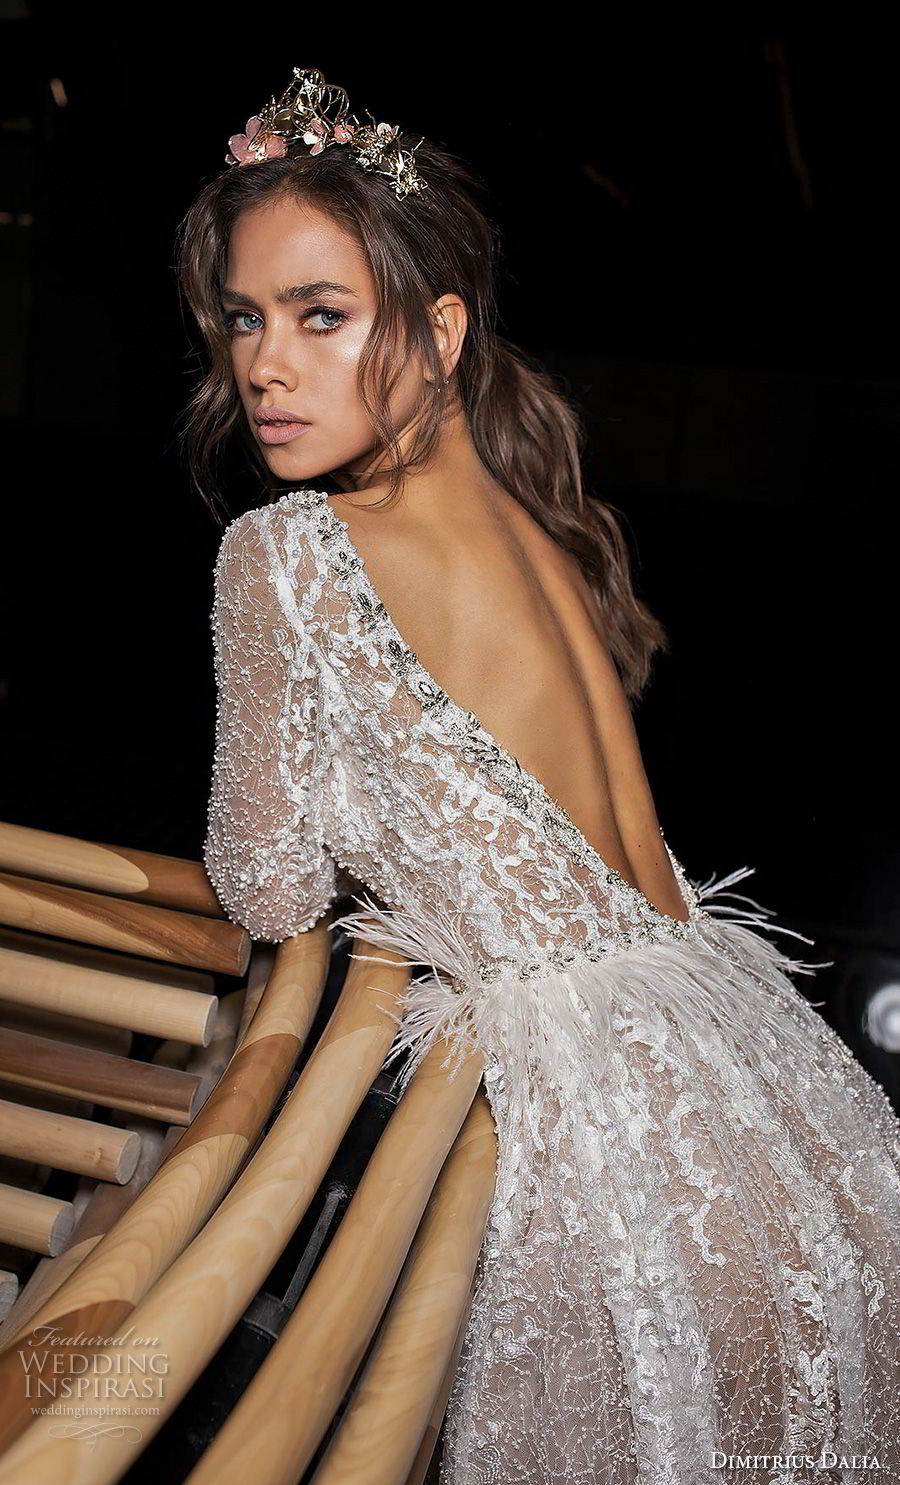 dimitrius dalia 2018 royal long sleeves deep v neck full embellishment sexy glamorous a line wedding dress low open back (2) zbv